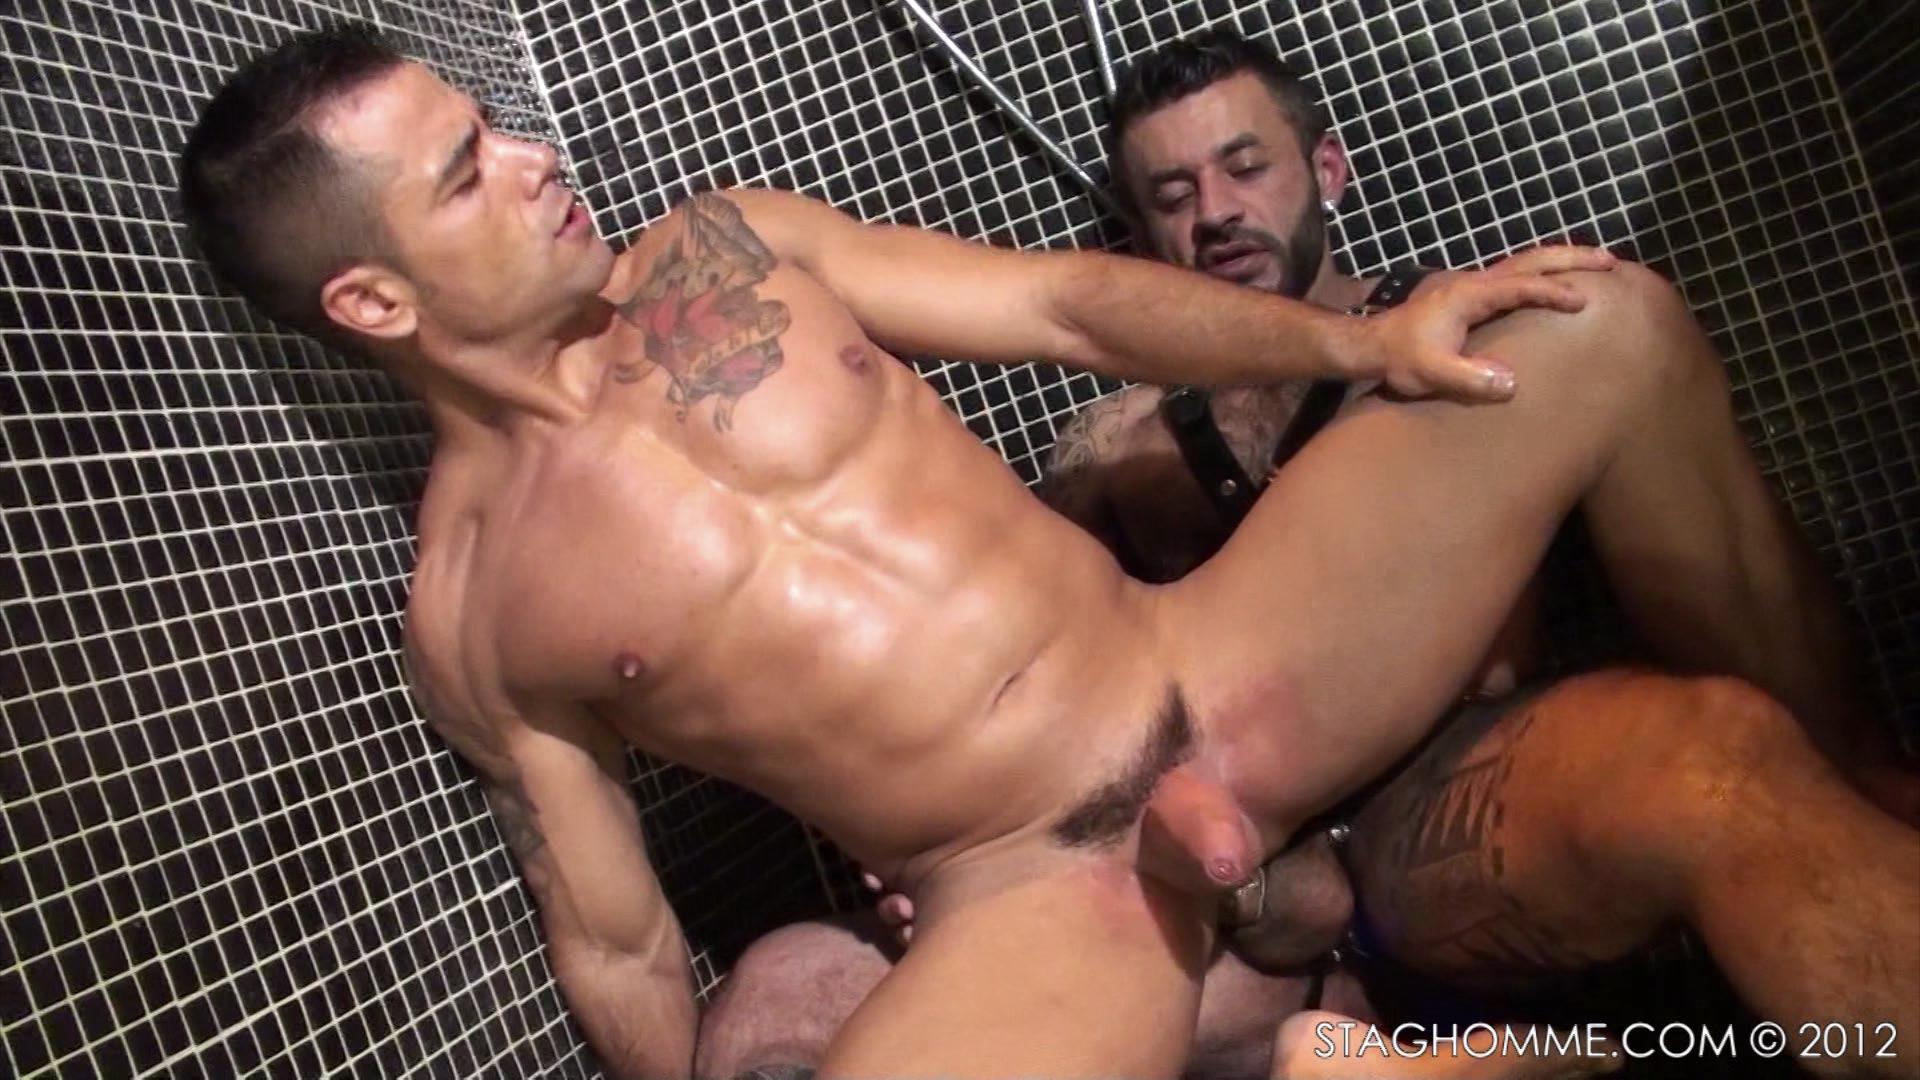 Dirty Boys Xvideo gay